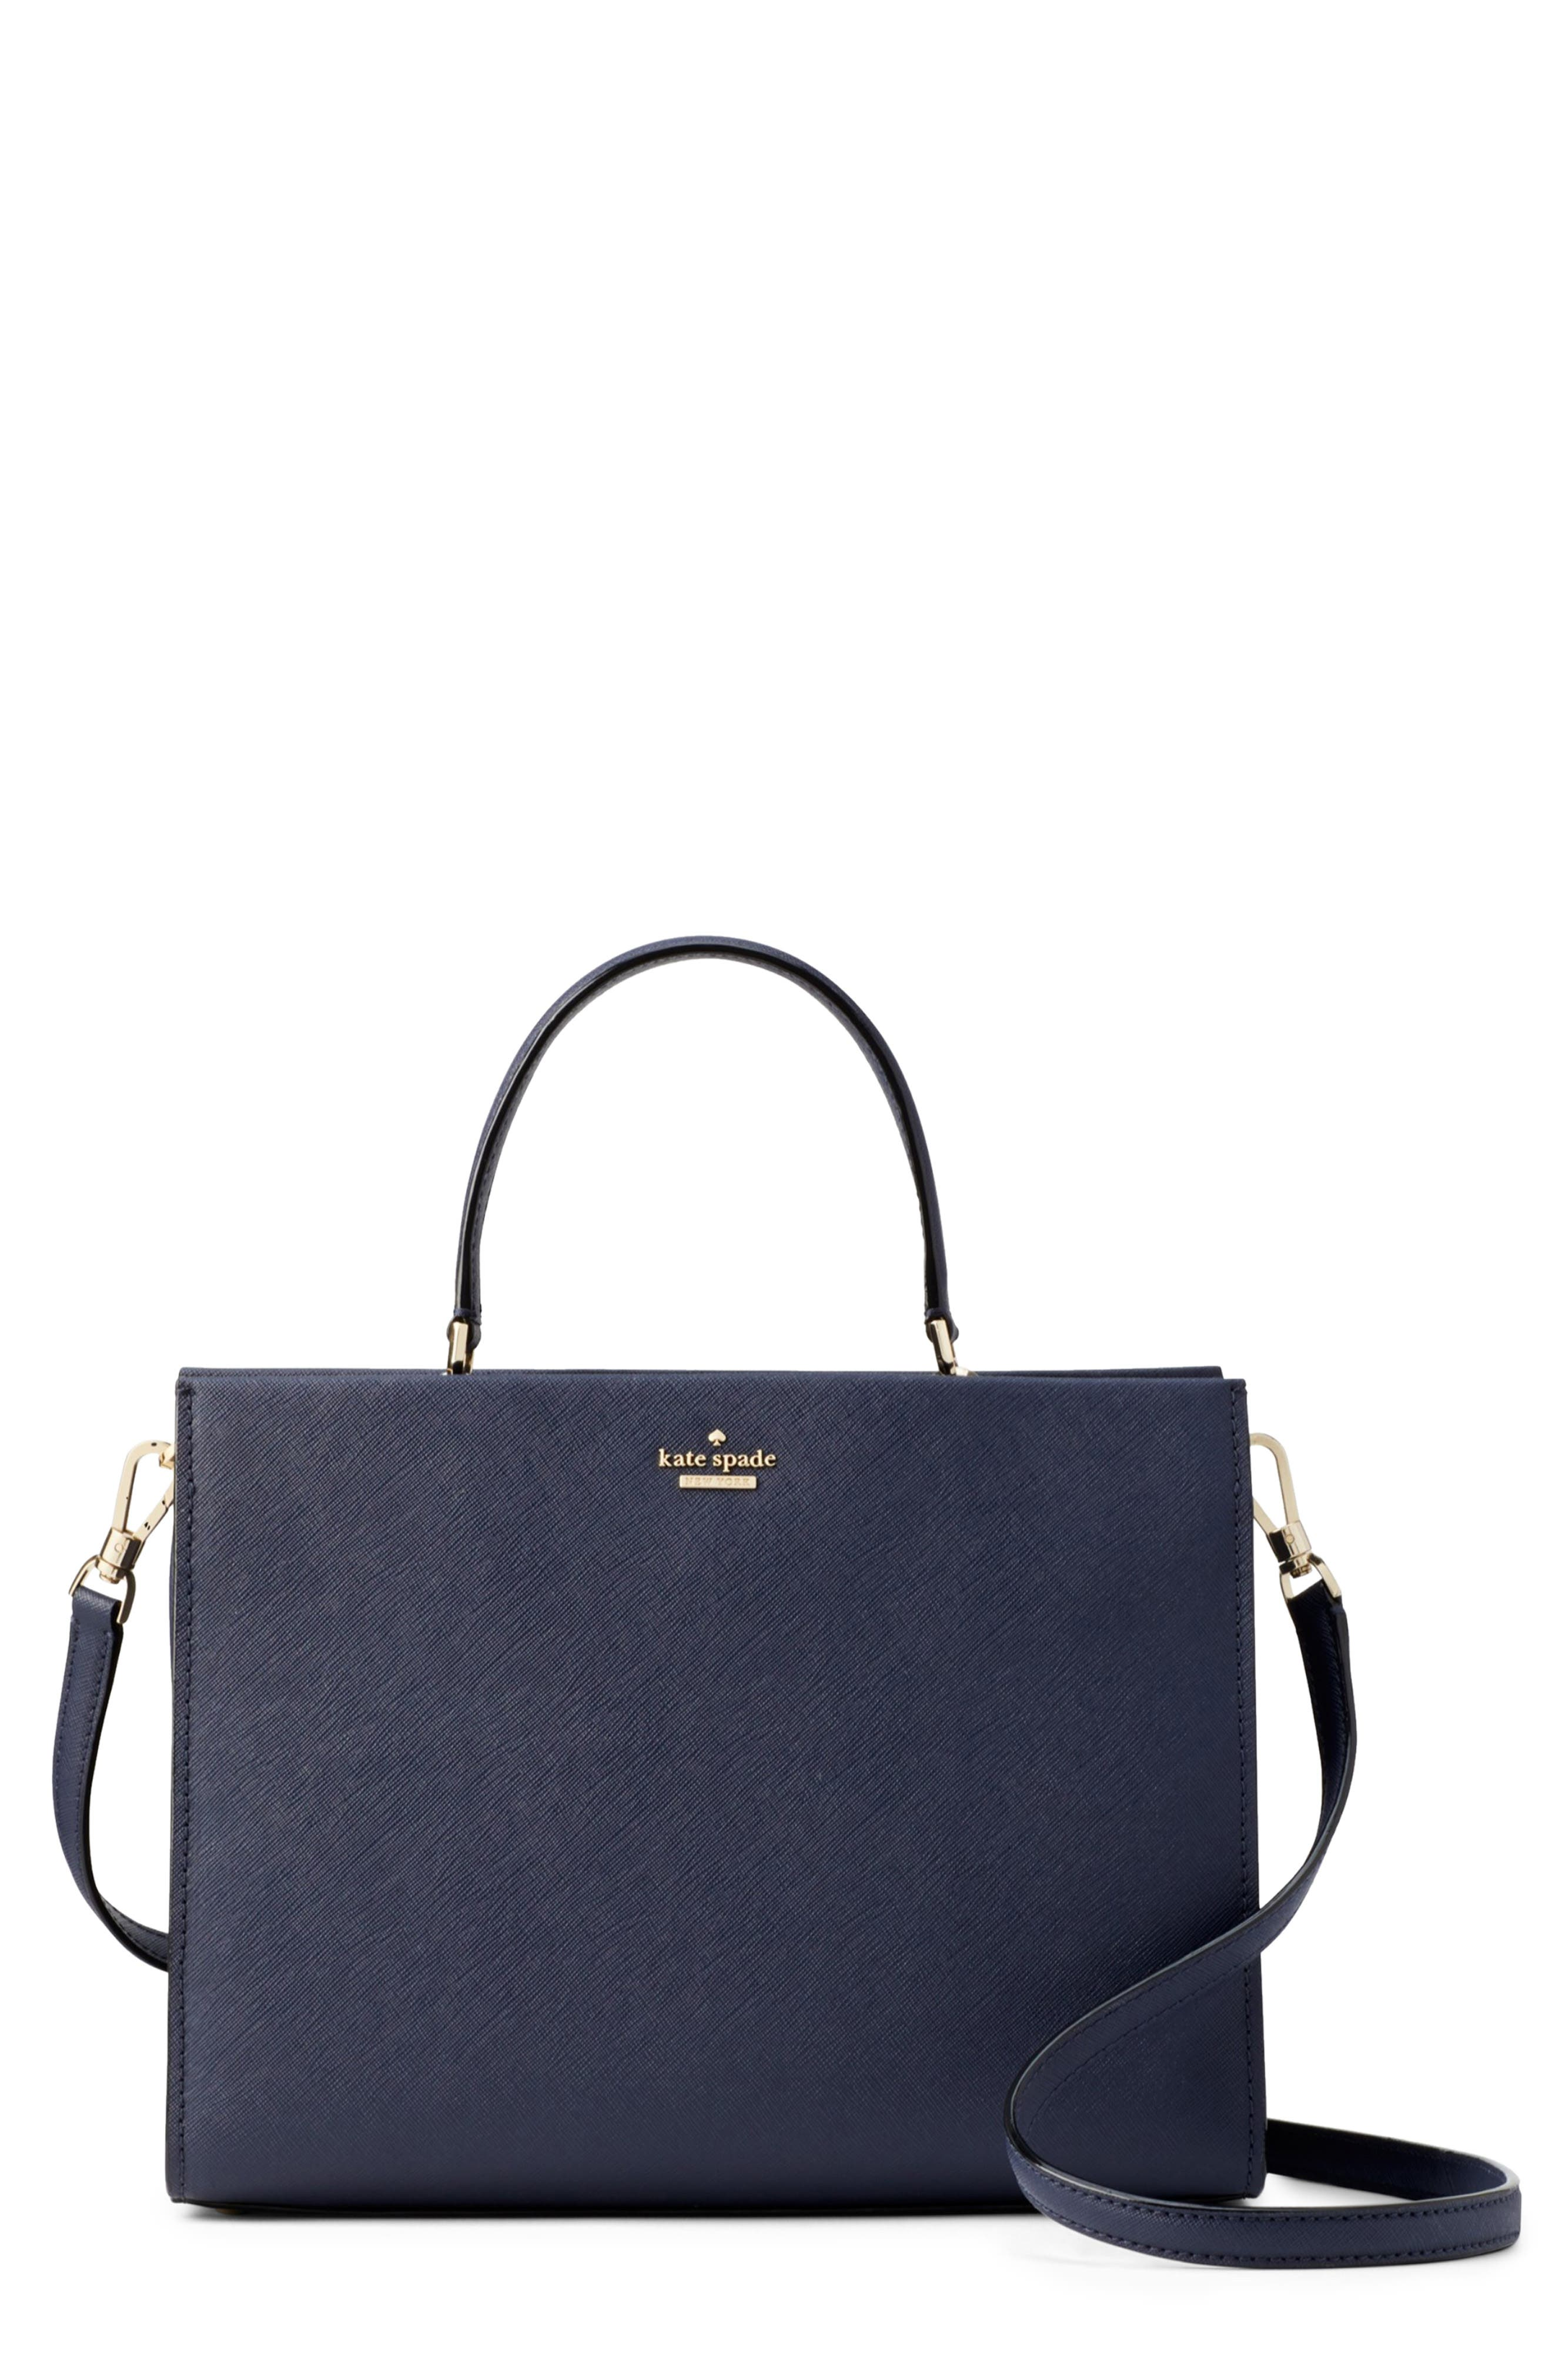 cameron street - sara leather satchel,                             Main thumbnail 1, color,                             BLAZER BLUE